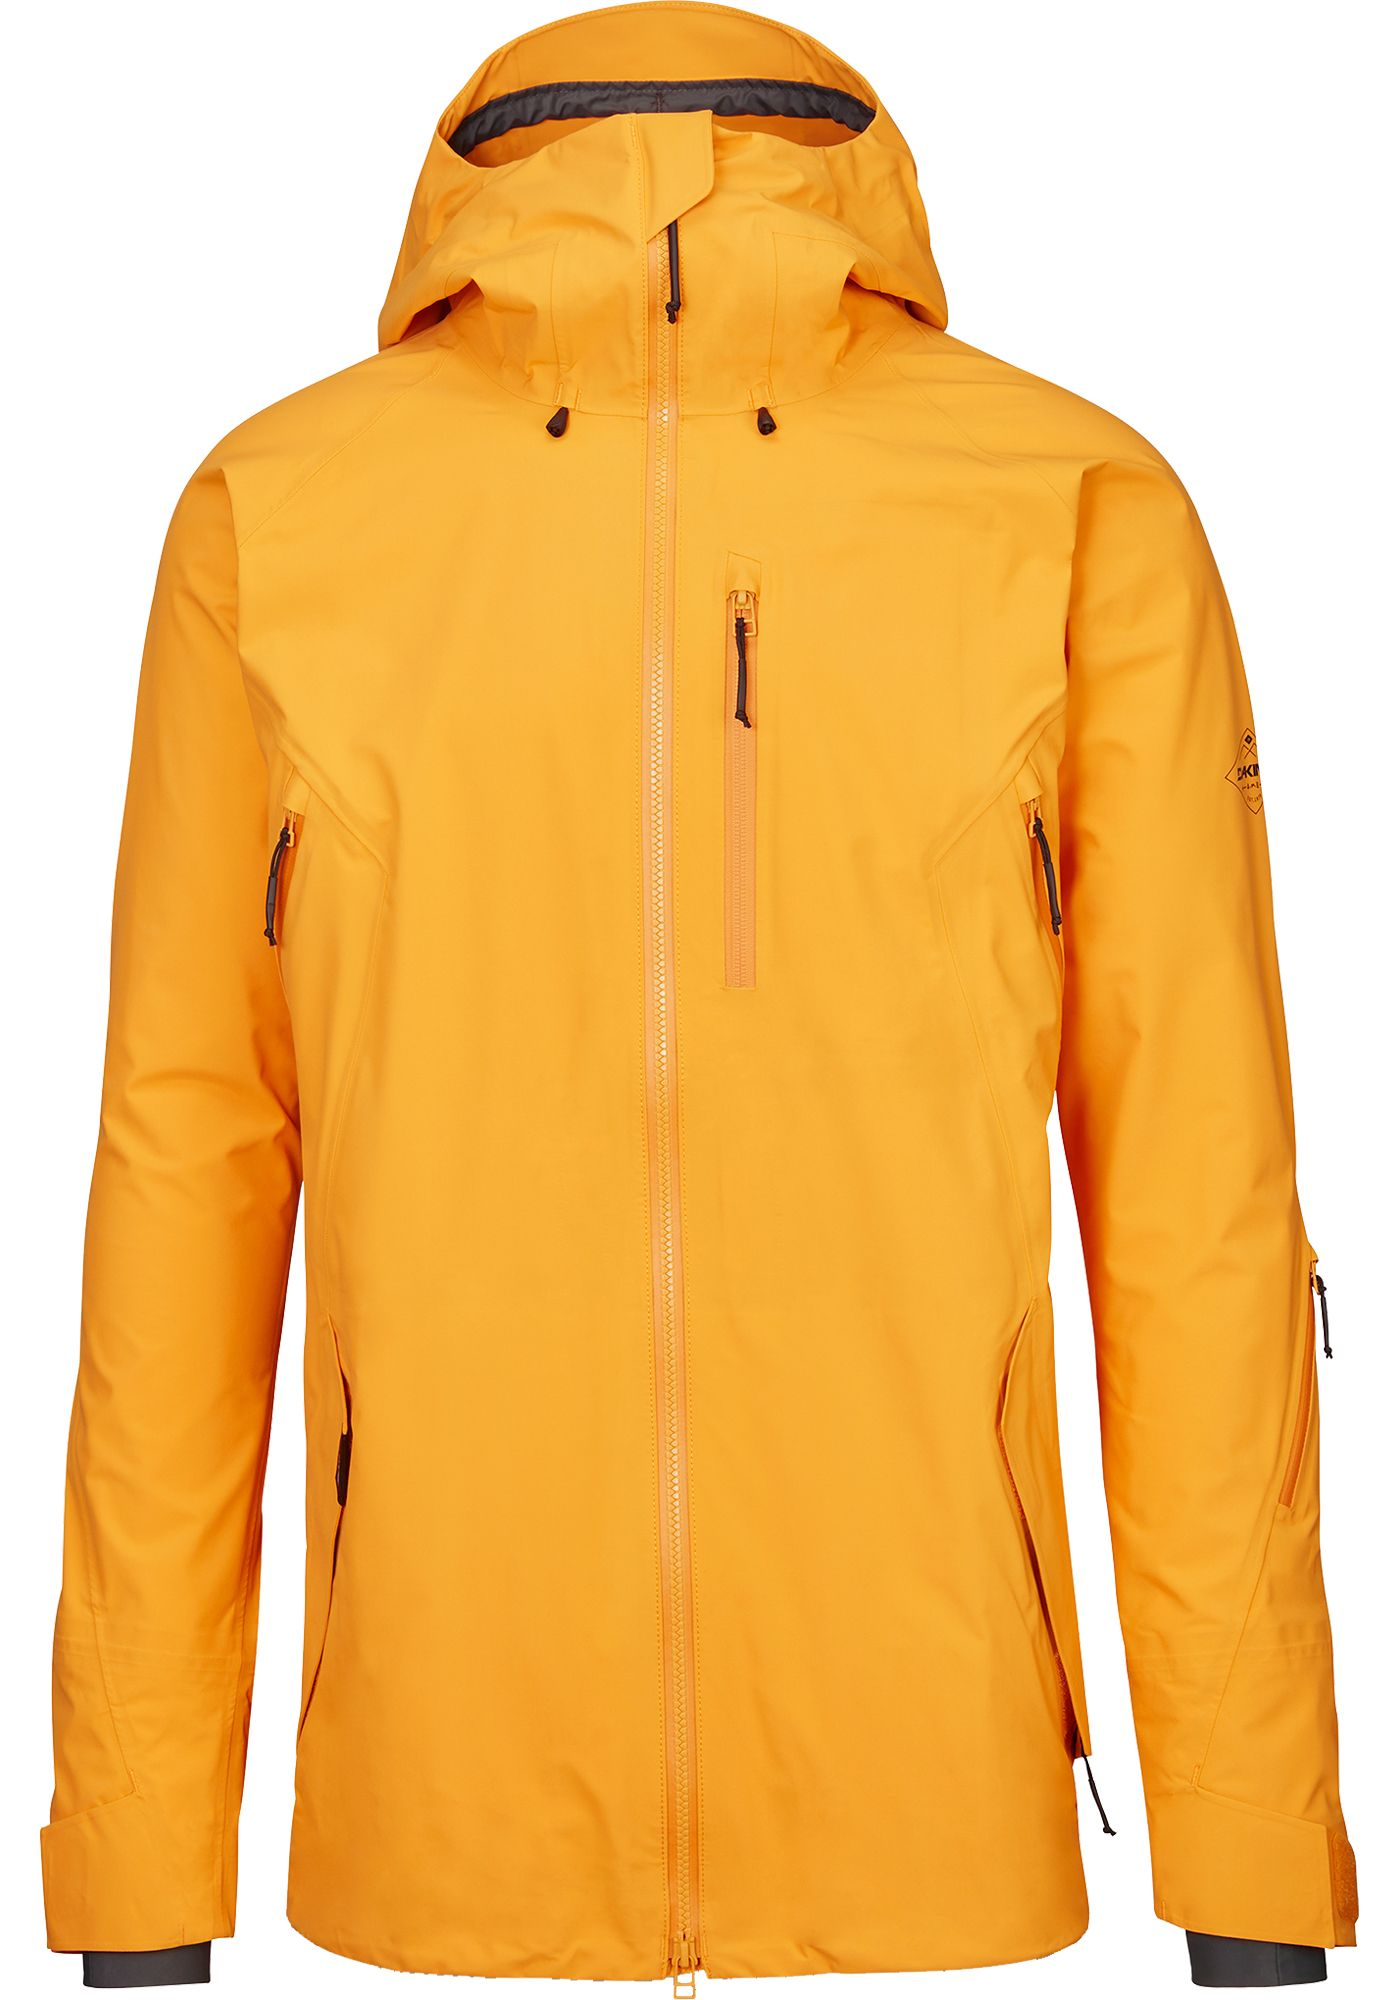 DAKINE Men's Gearhart GORE-TEX 3L Ski Jacket